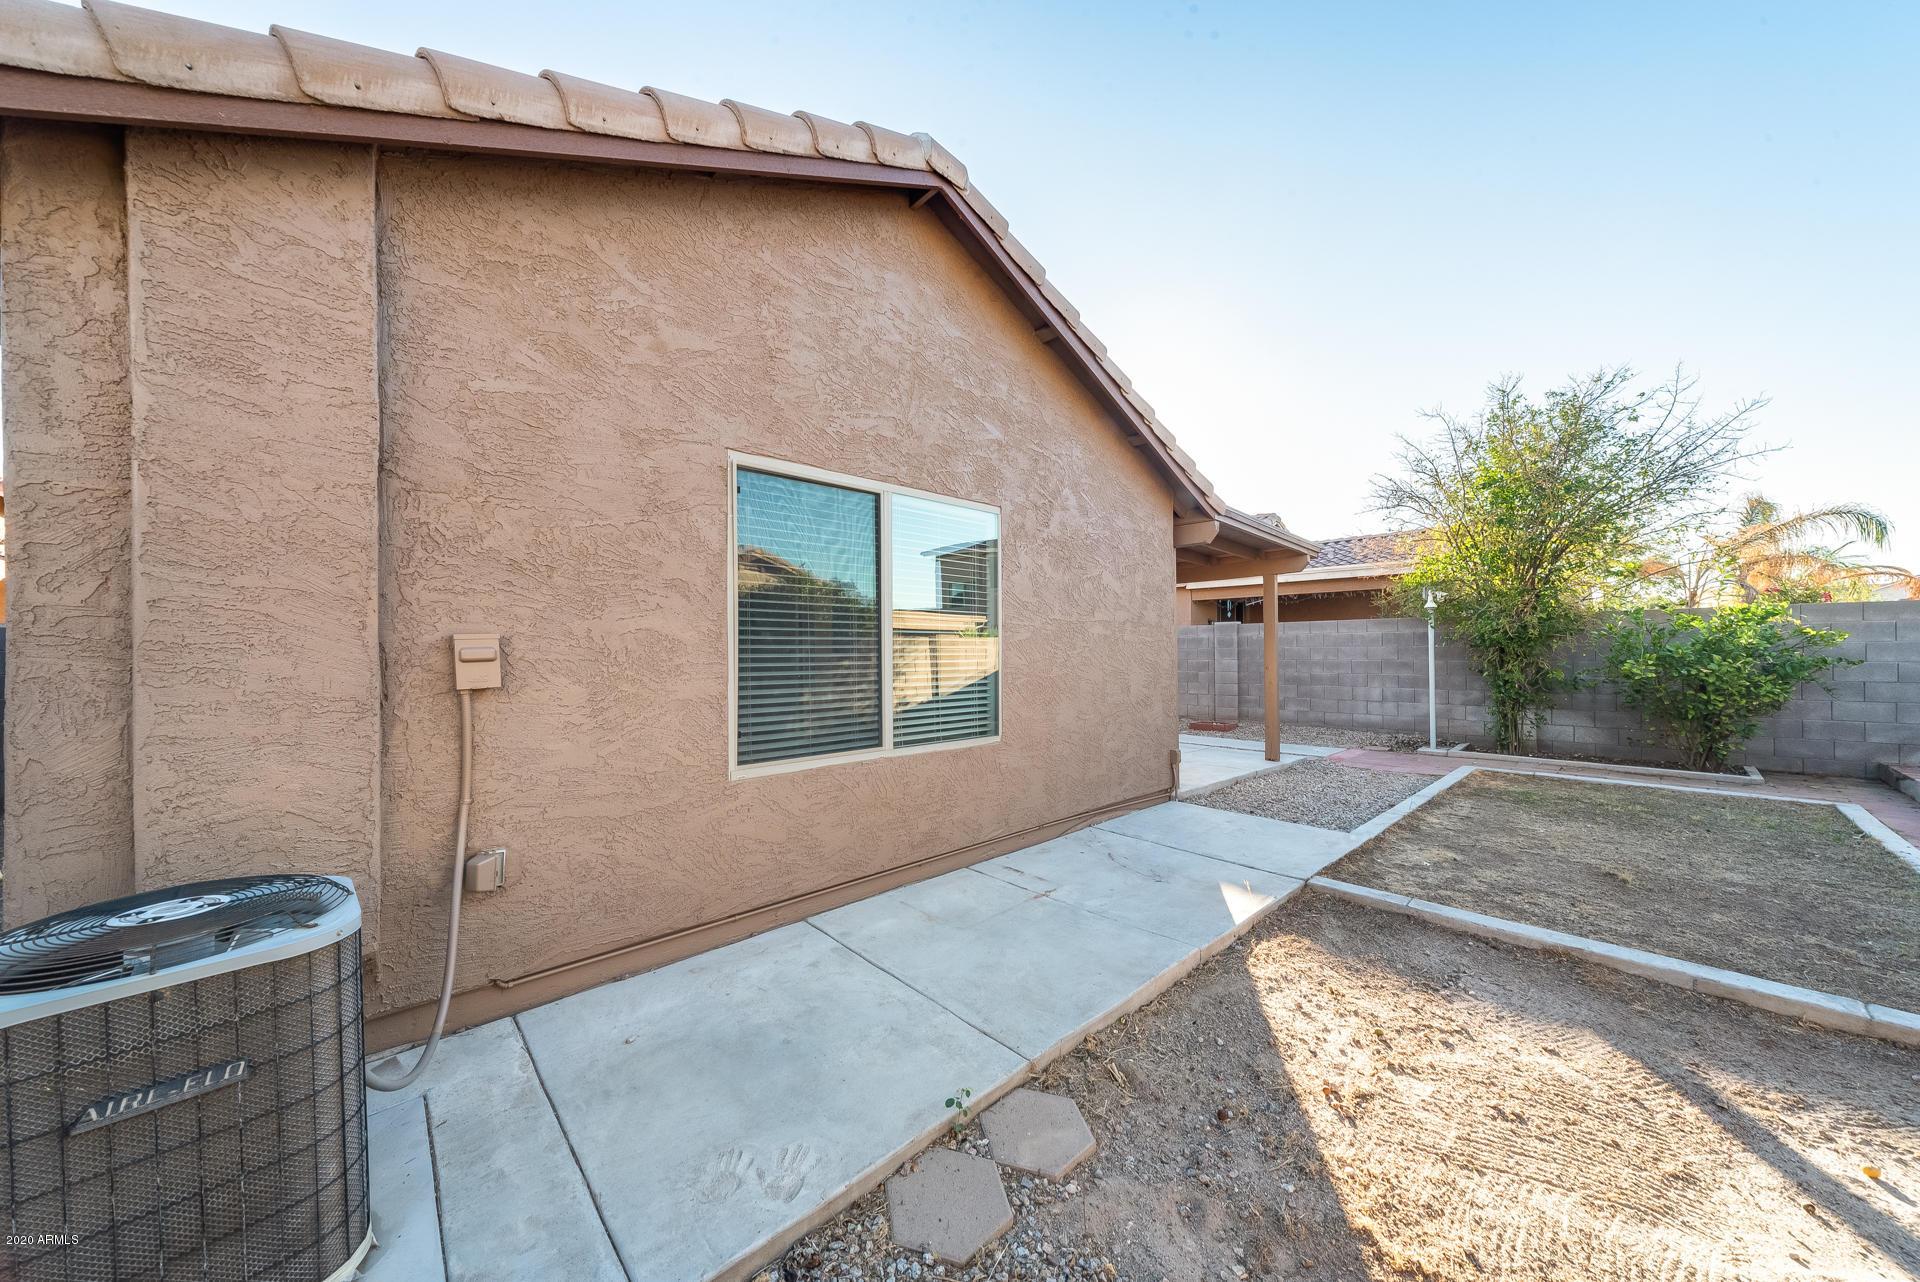 MLS 6159046 2090 W GOLD DUST Avenue, Queen Creek, AZ 85142 Queen Creek AZ San Tan Heights